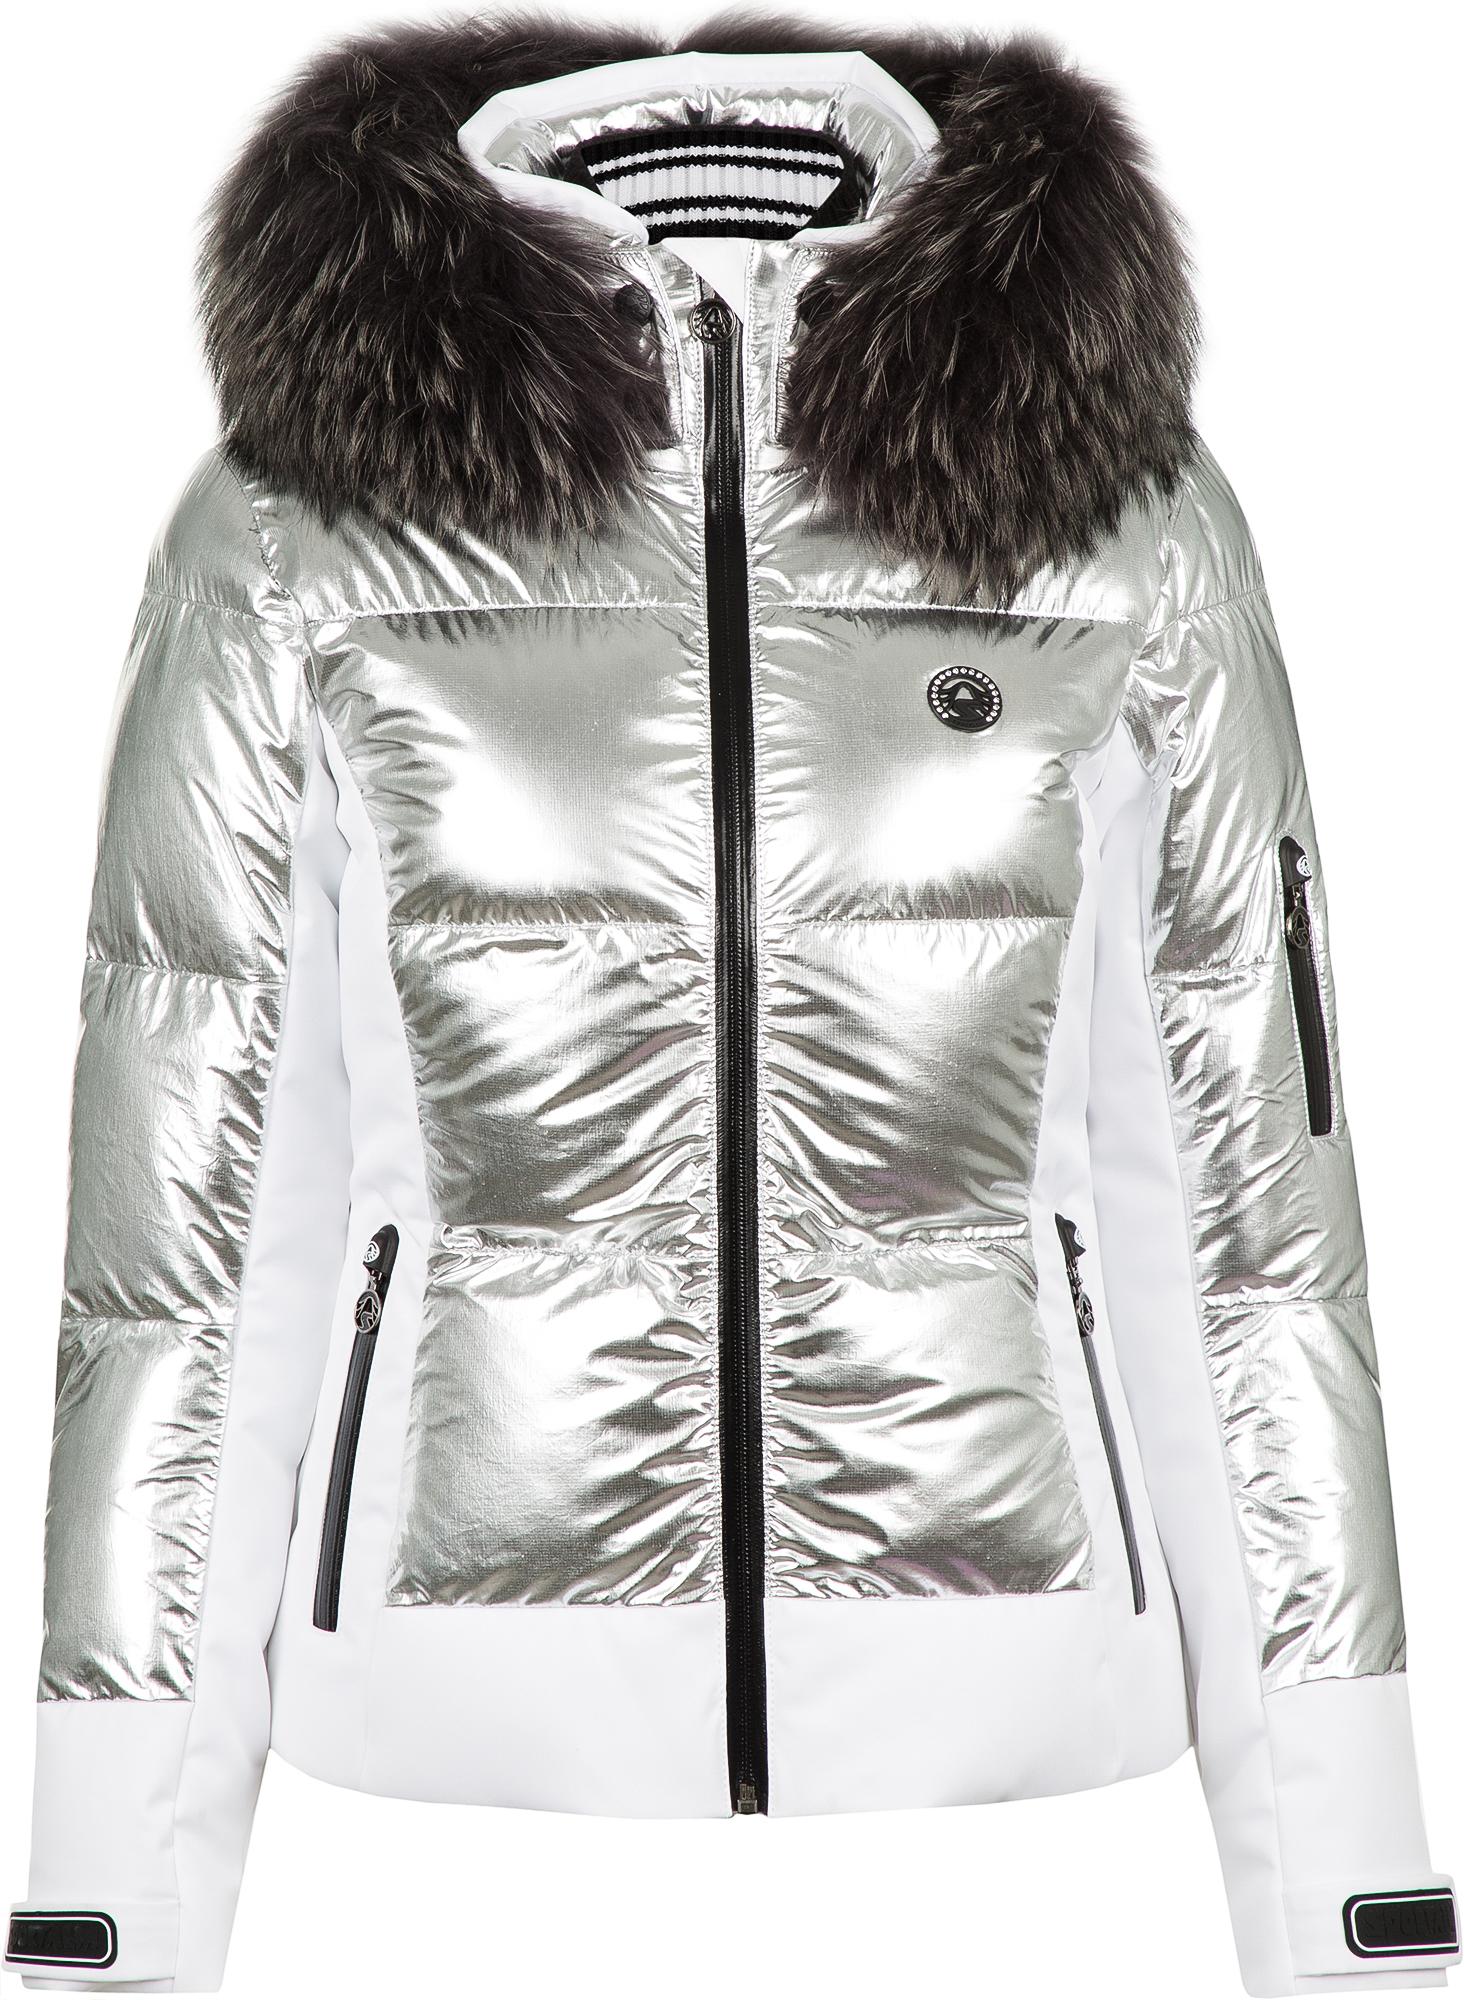 цена Sportalm Куртка утепленная женская Sportalm Cooris Metallic m.Kap+P, размер 44 онлайн в 2017 году